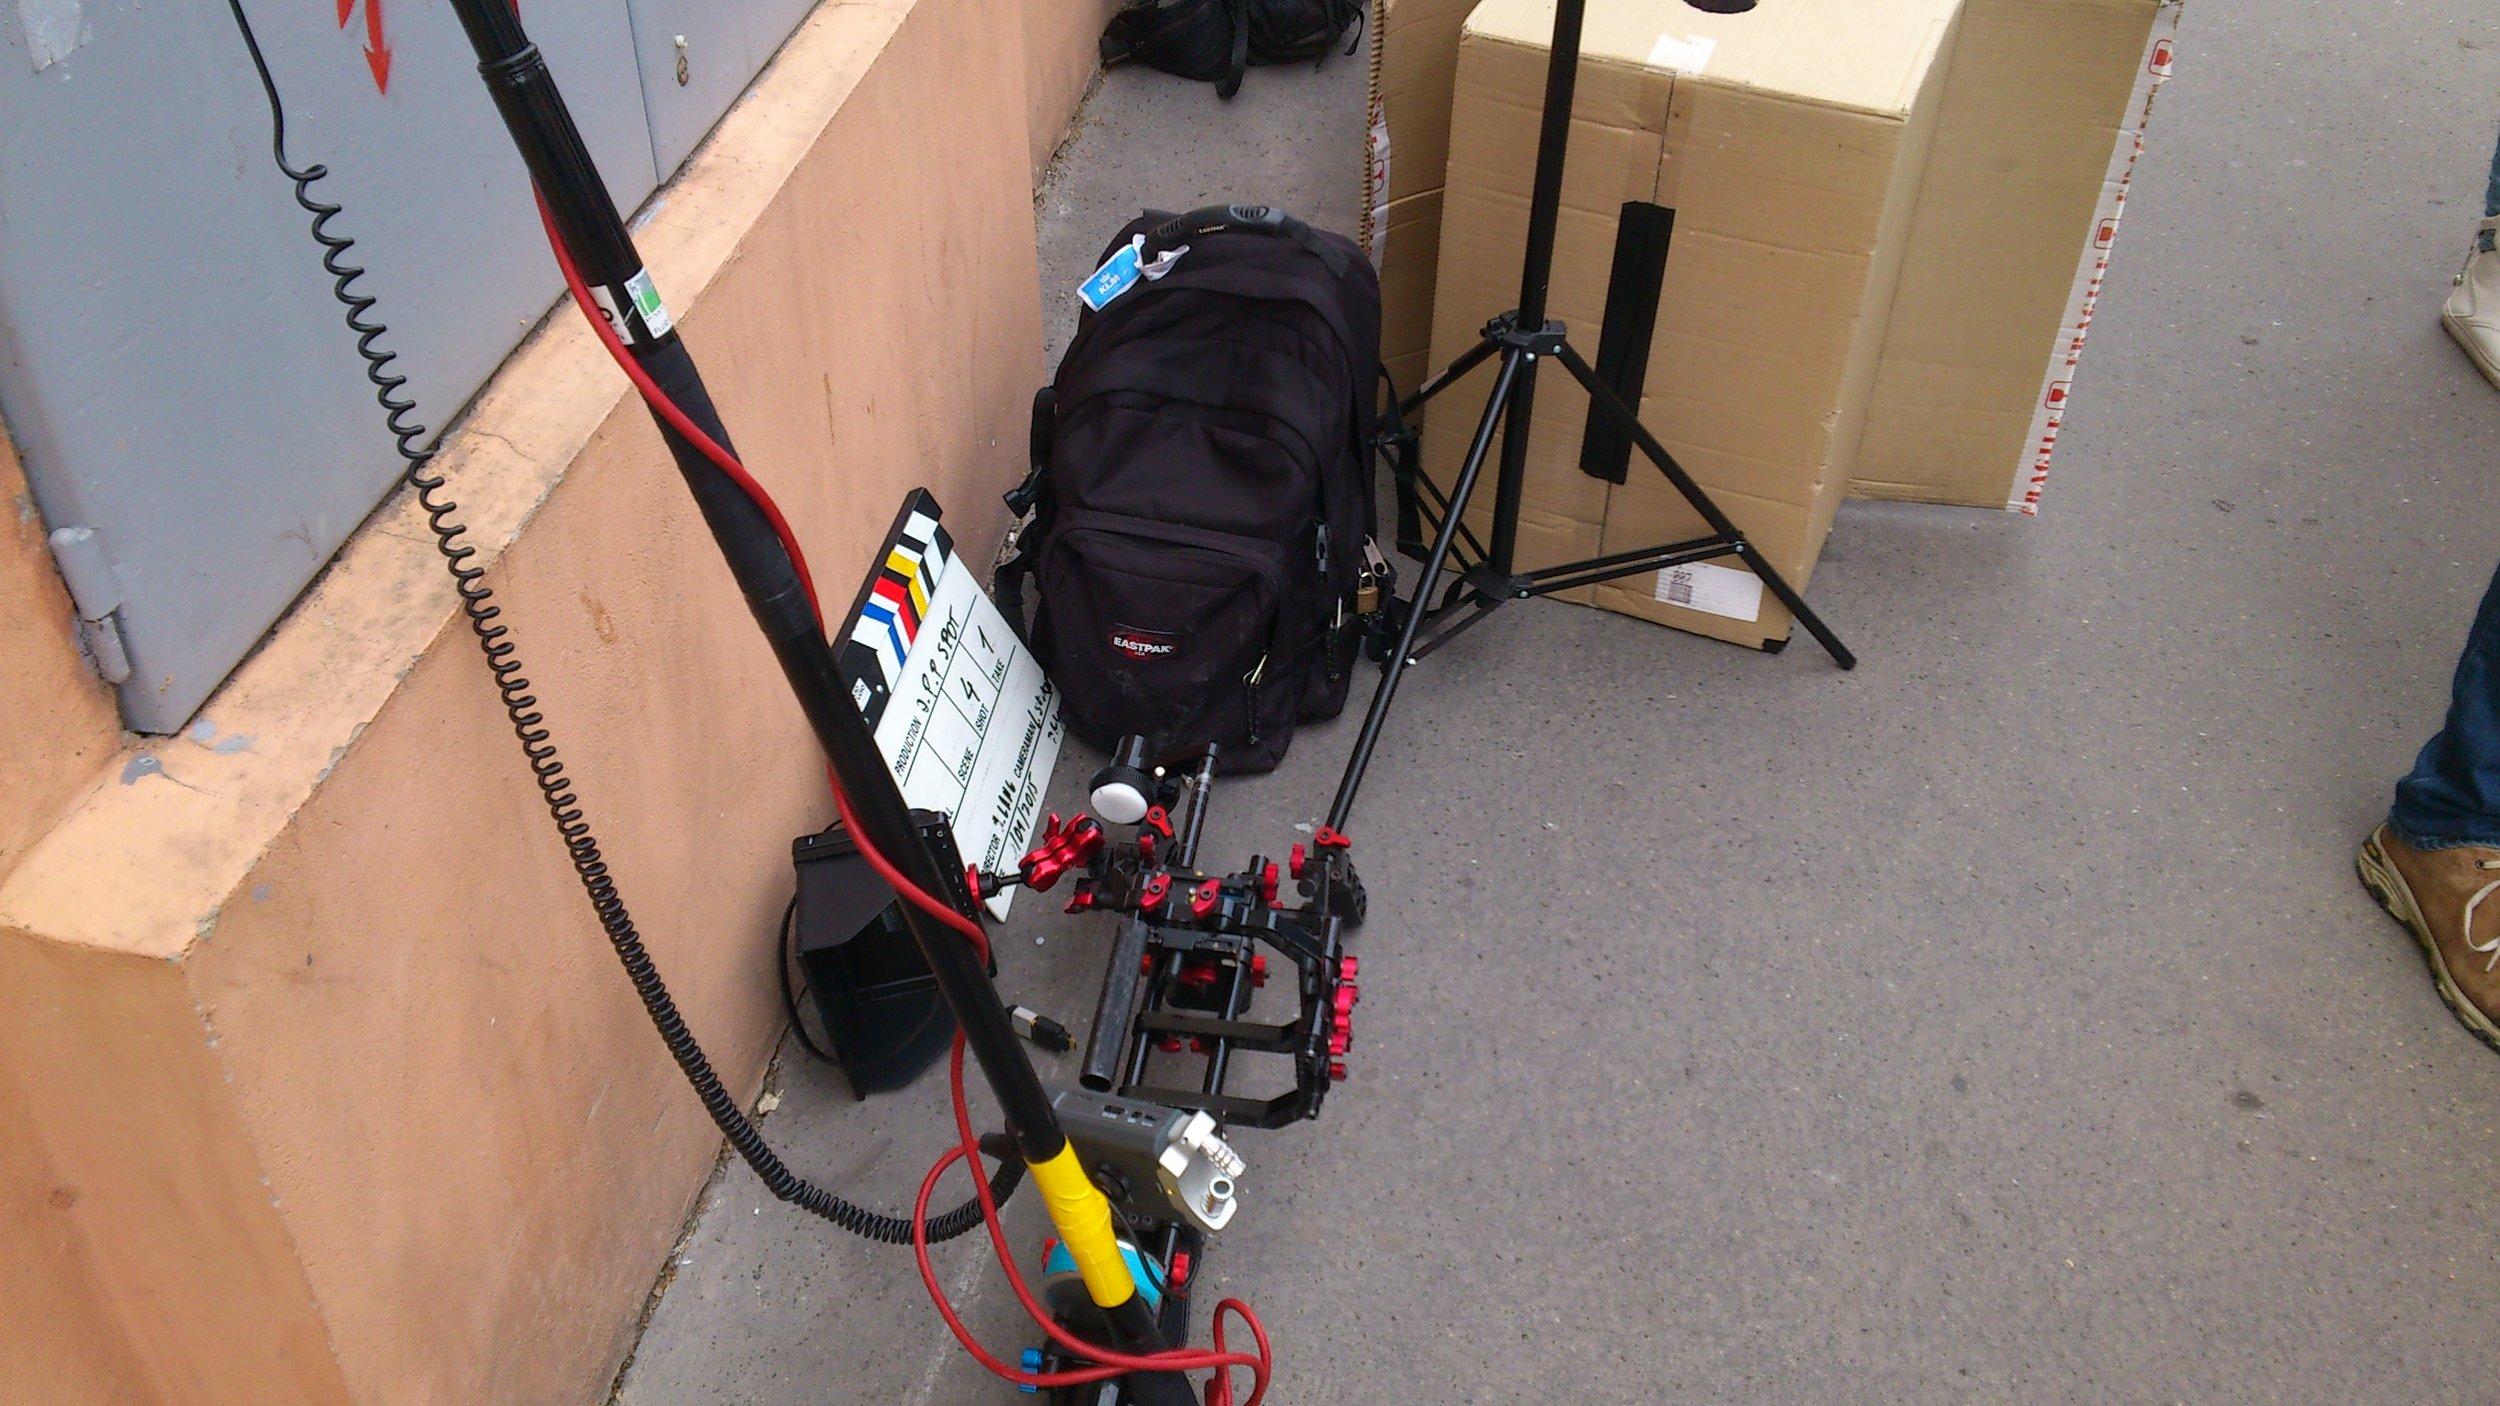 PIFA film school